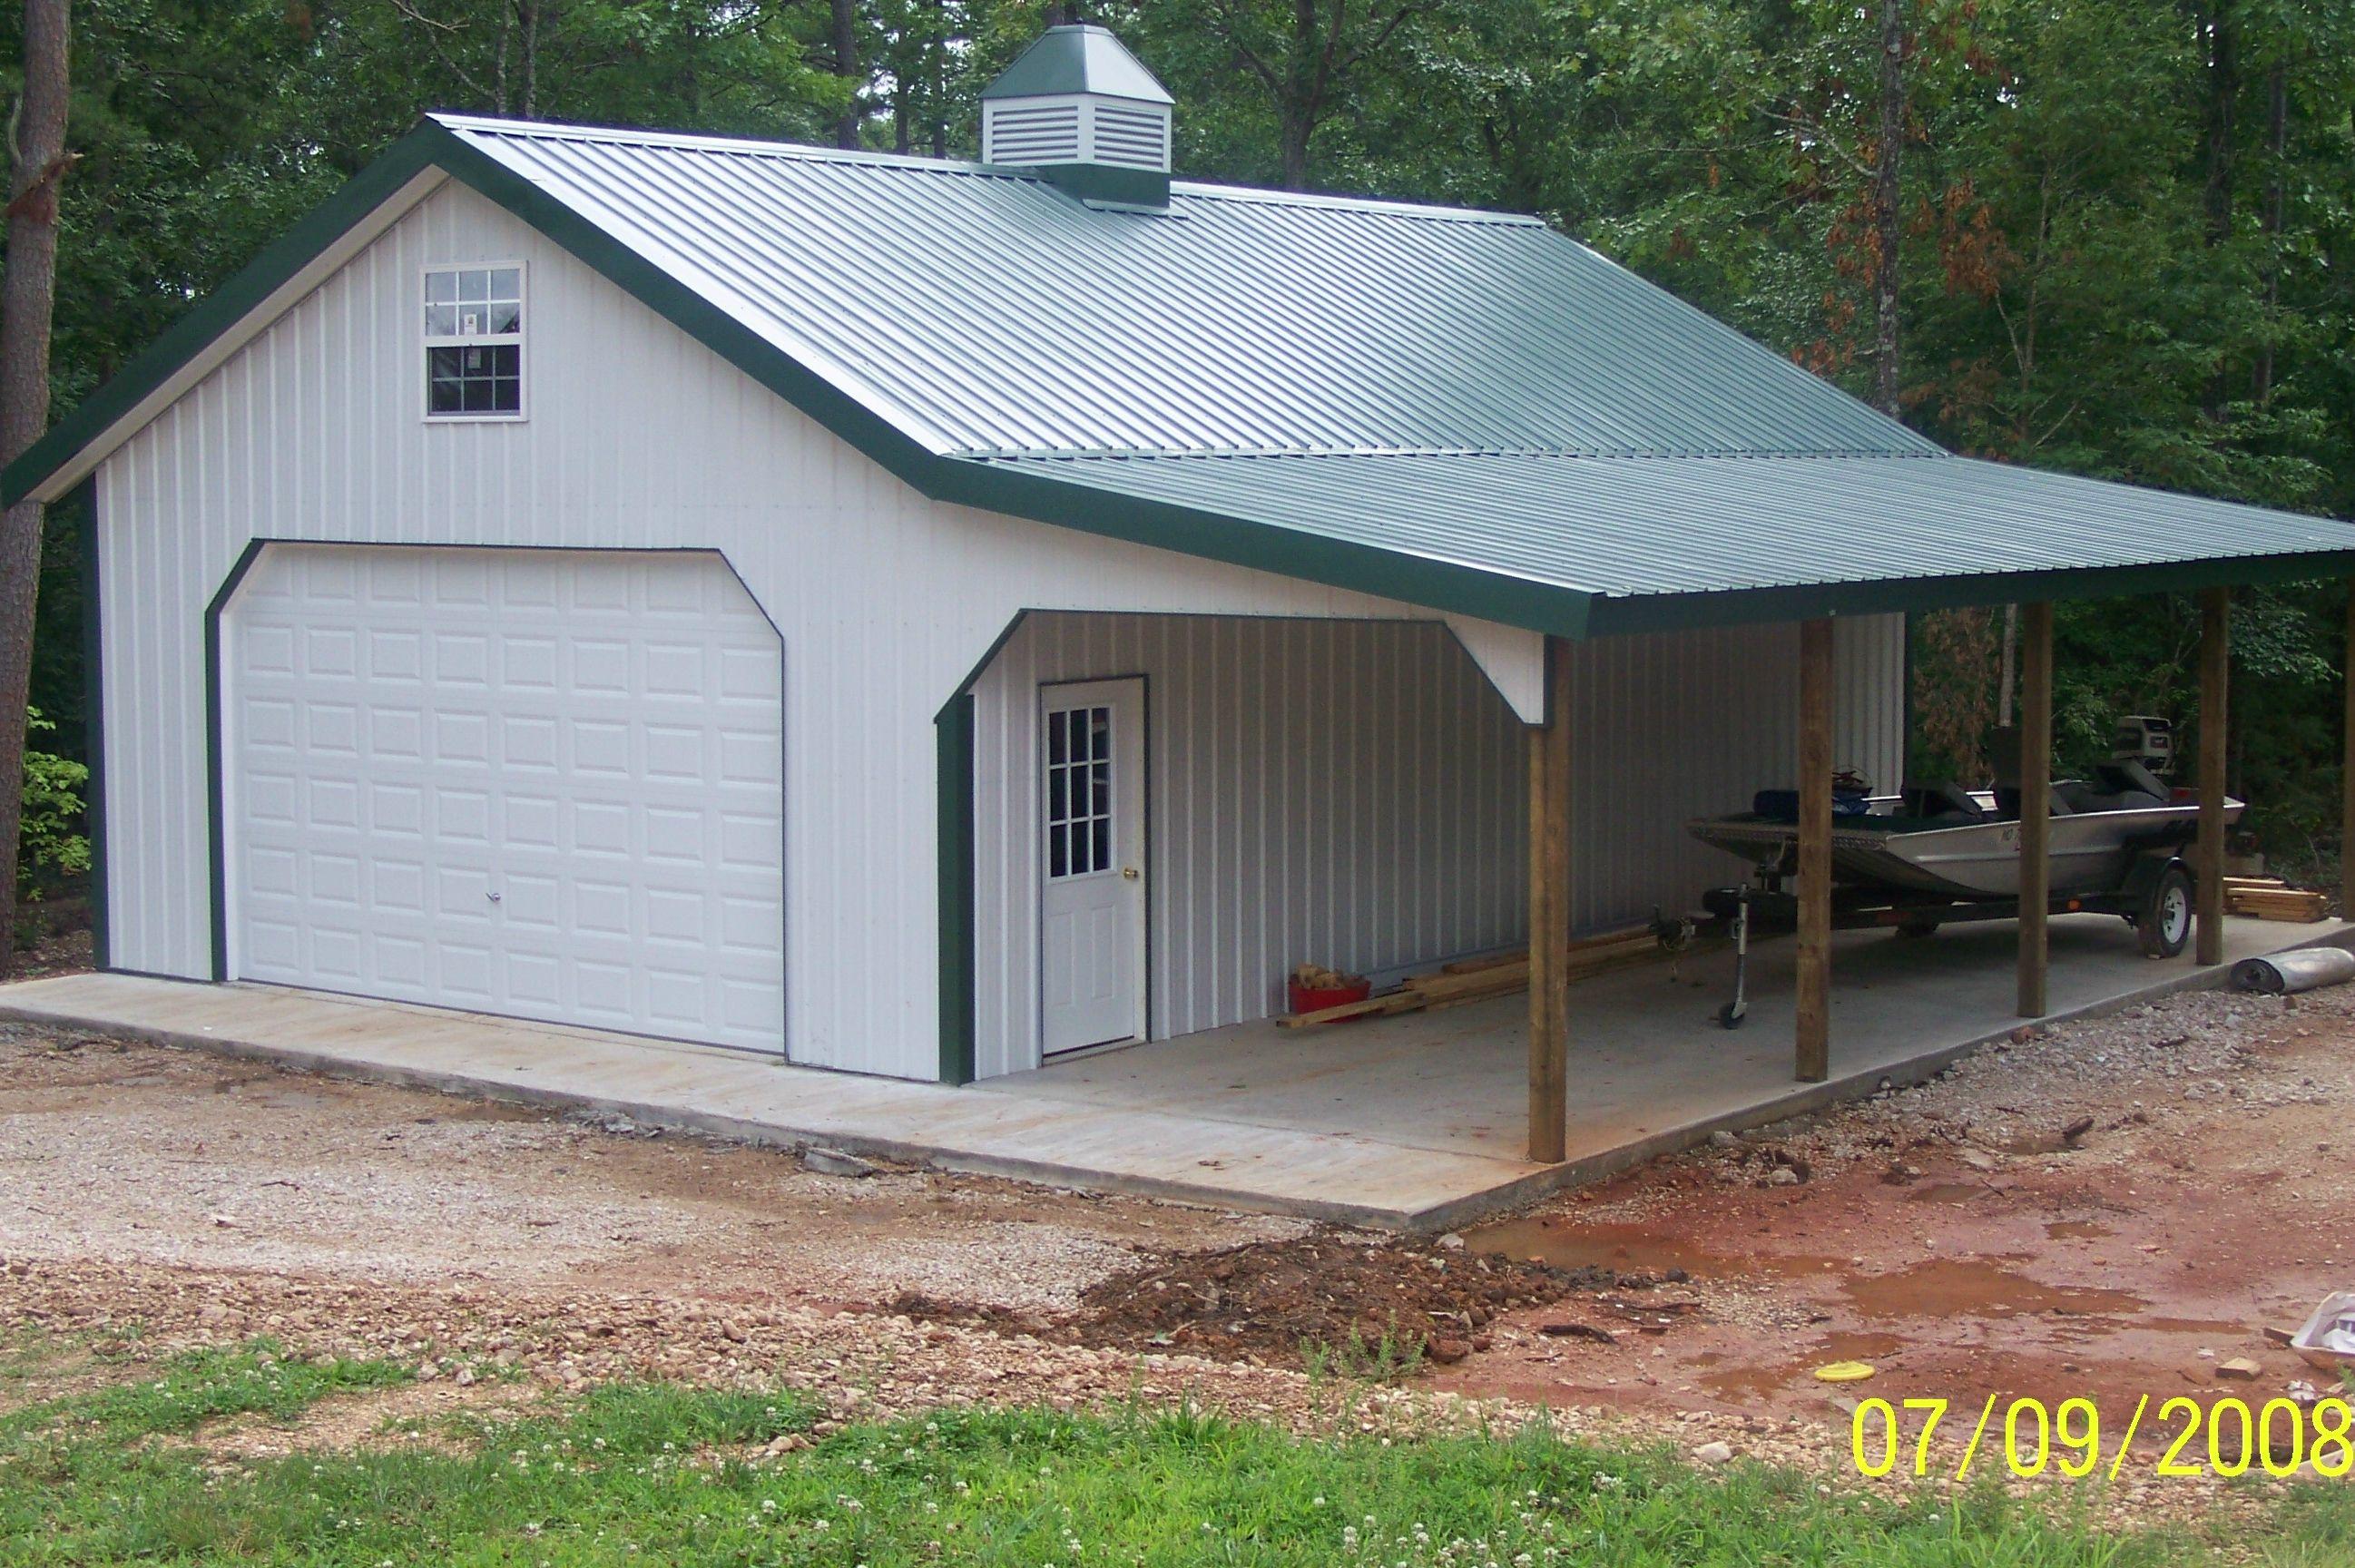 Garage Plans | 58 Garage Plans and Free DIY Building ...